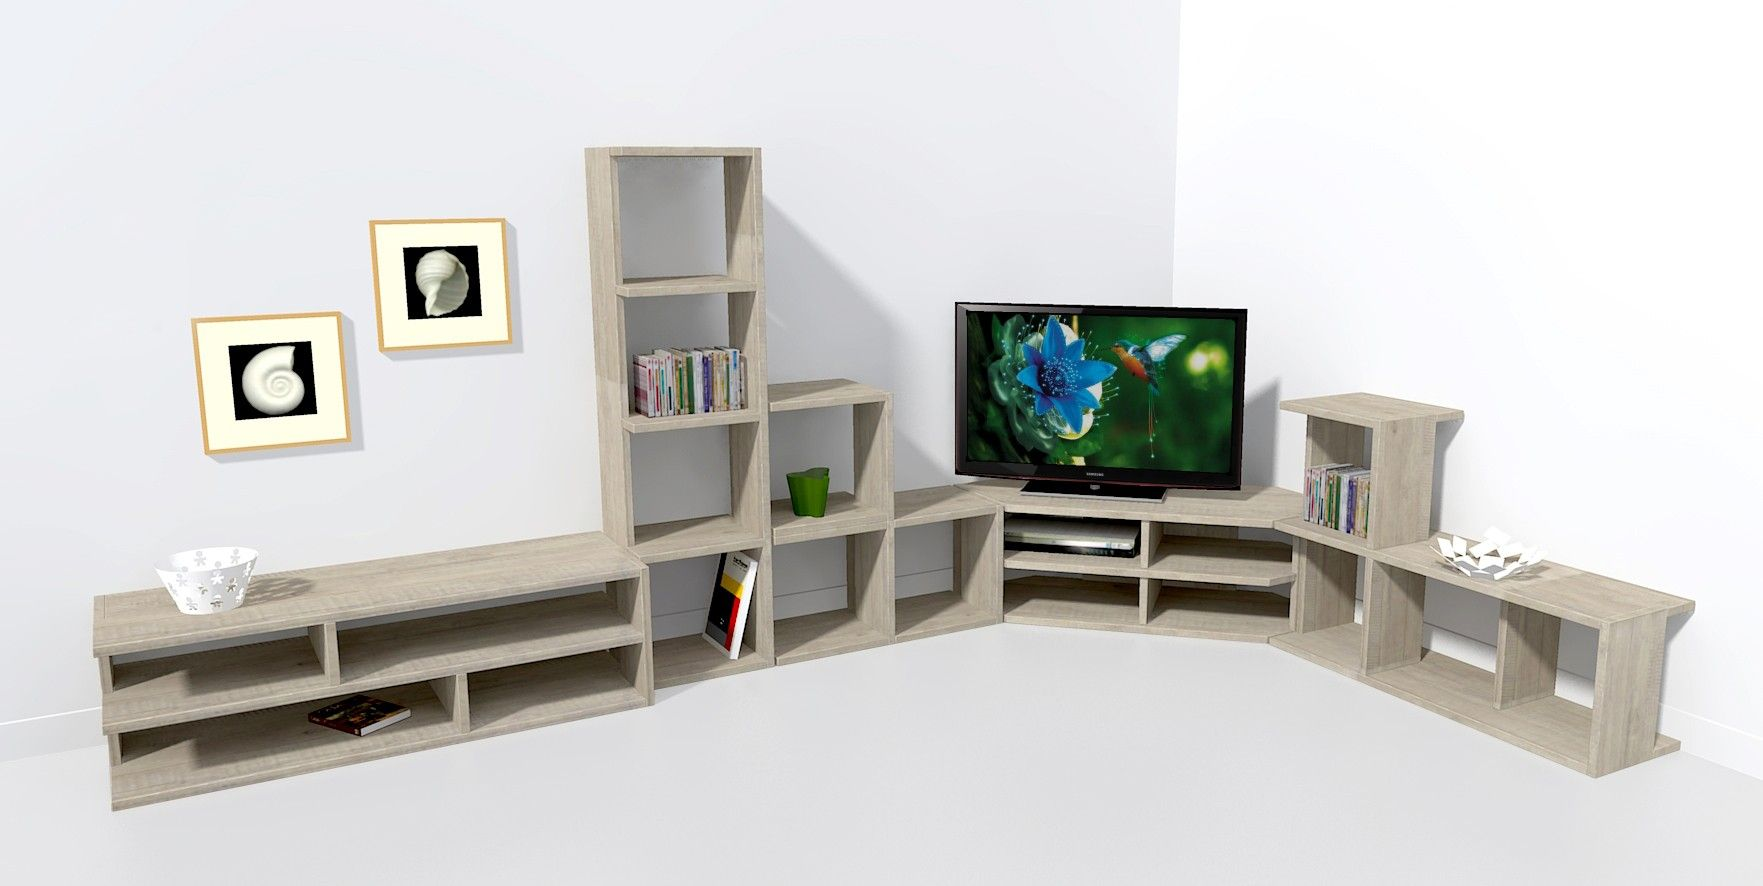 Meuble t l d 39 angle 140 cm meuble tv en 2019 meuble tele angle meuble t l et meuble - Meuble tele angle ...